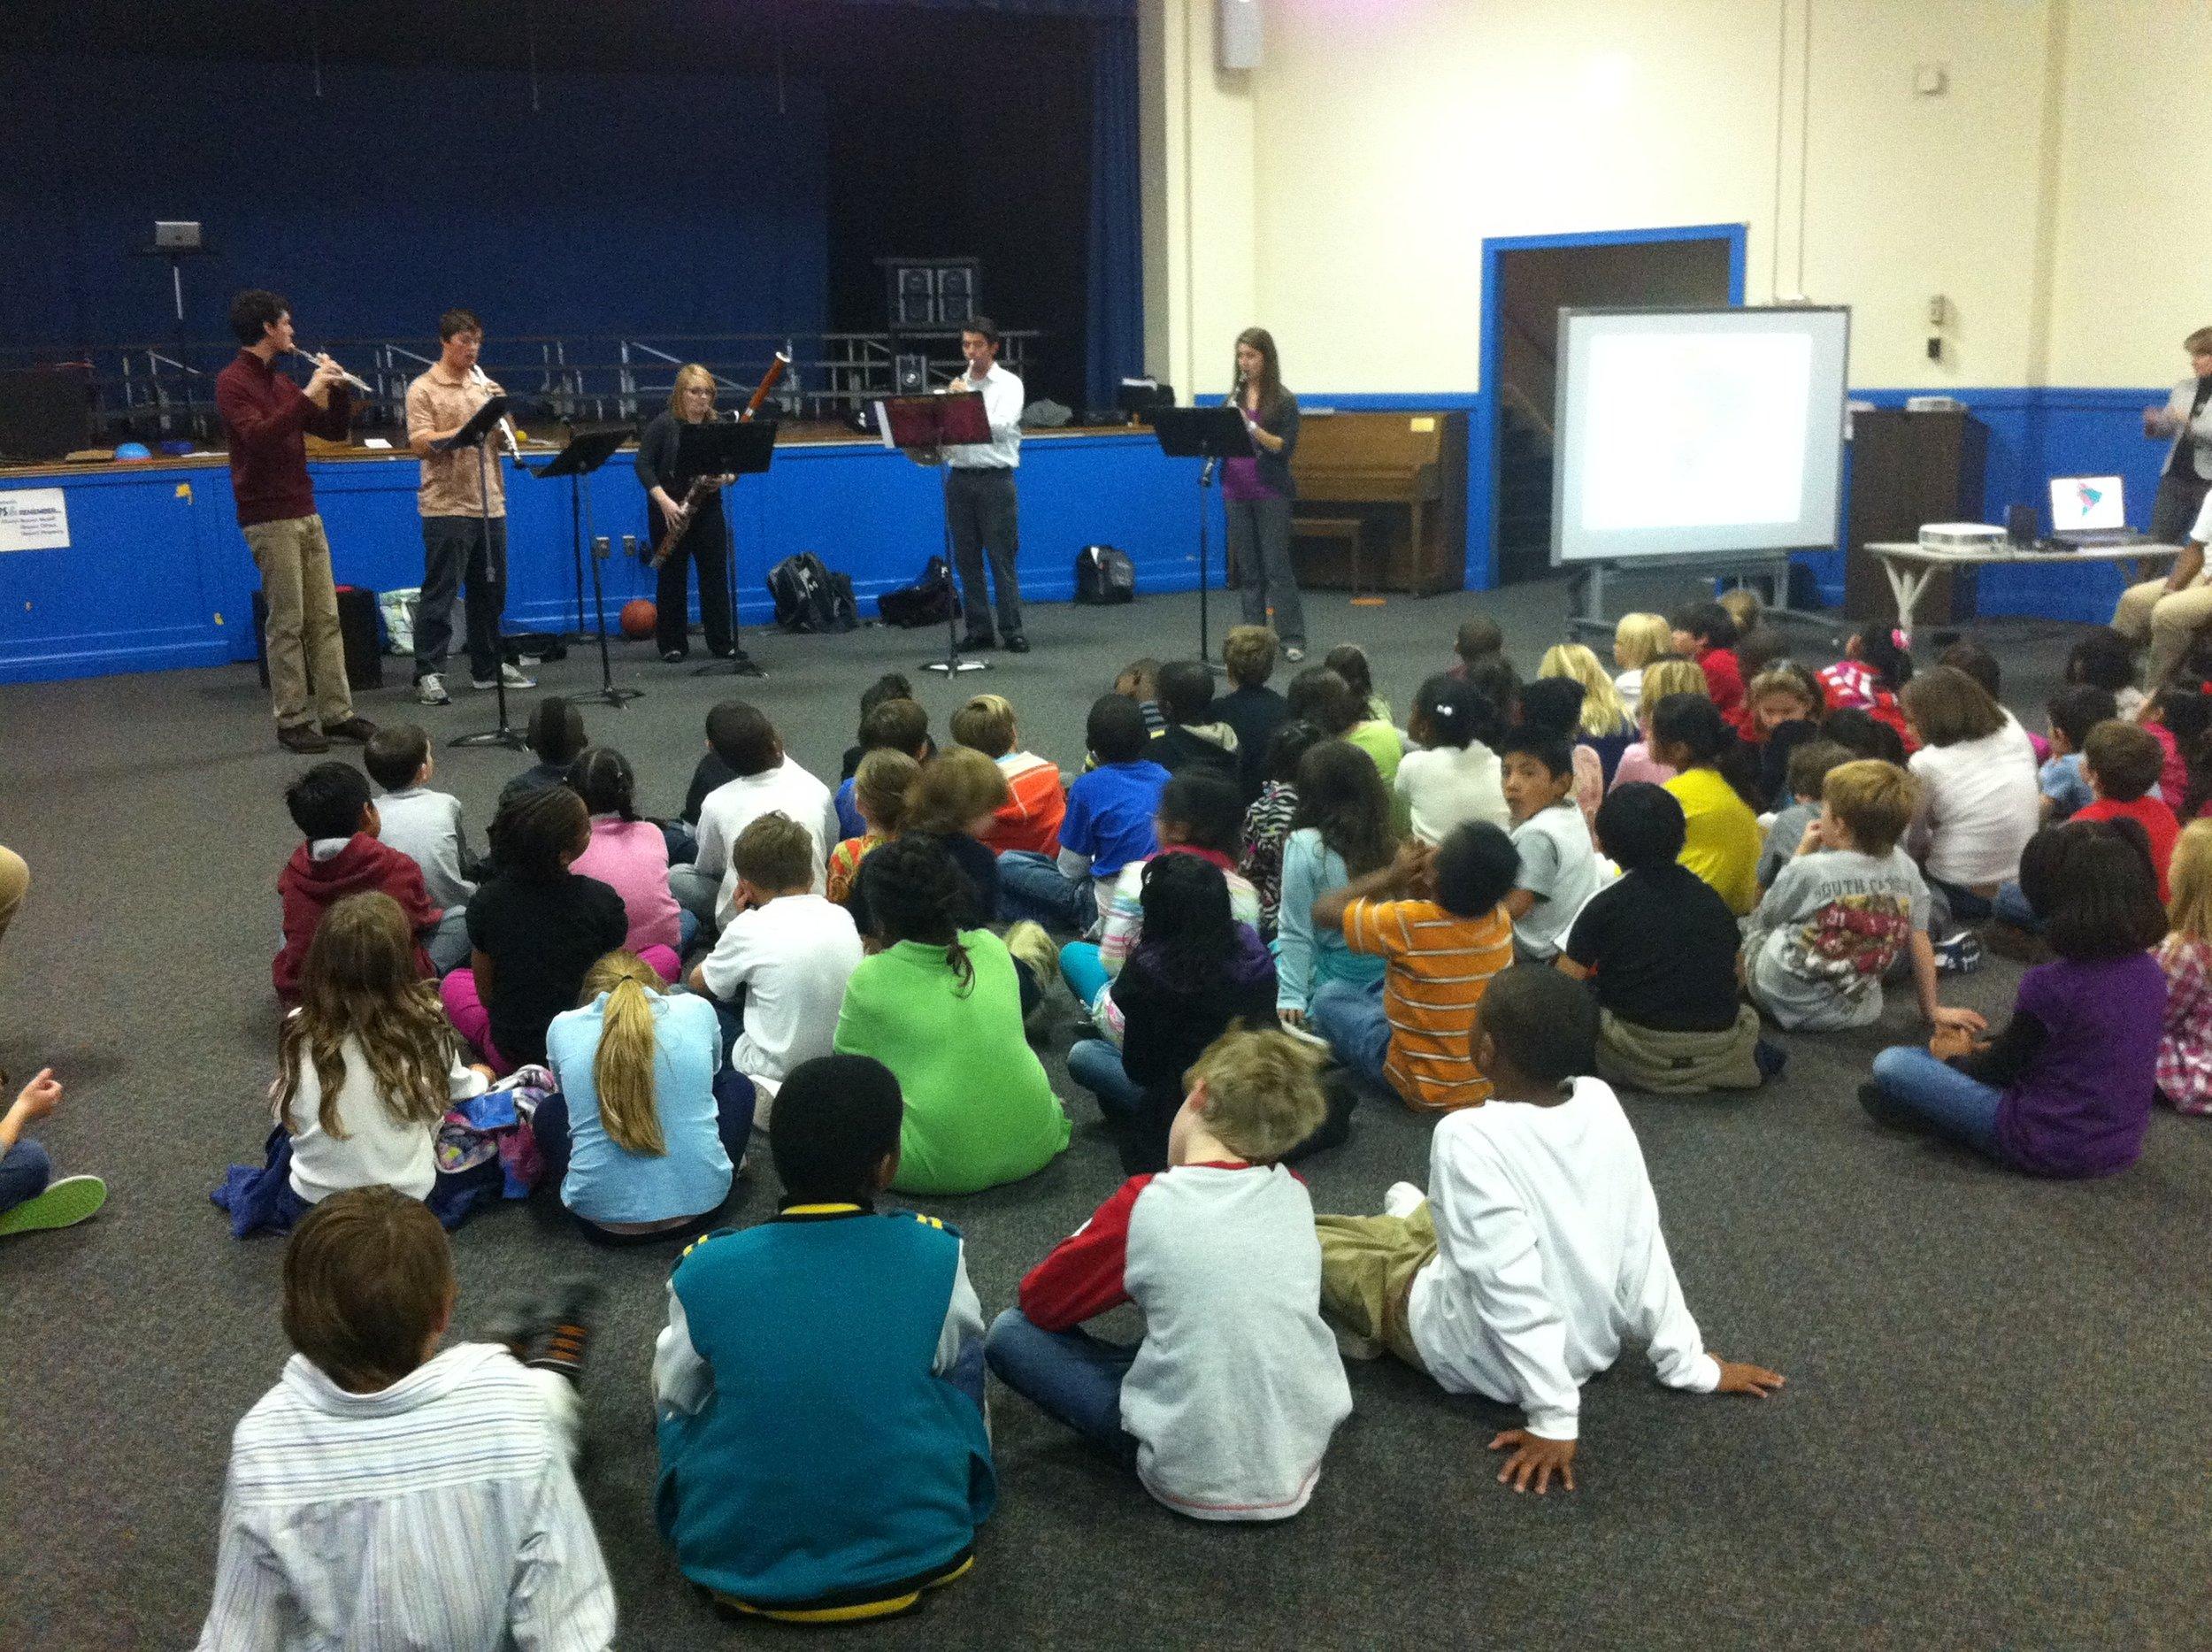 AC Moore Elementary School